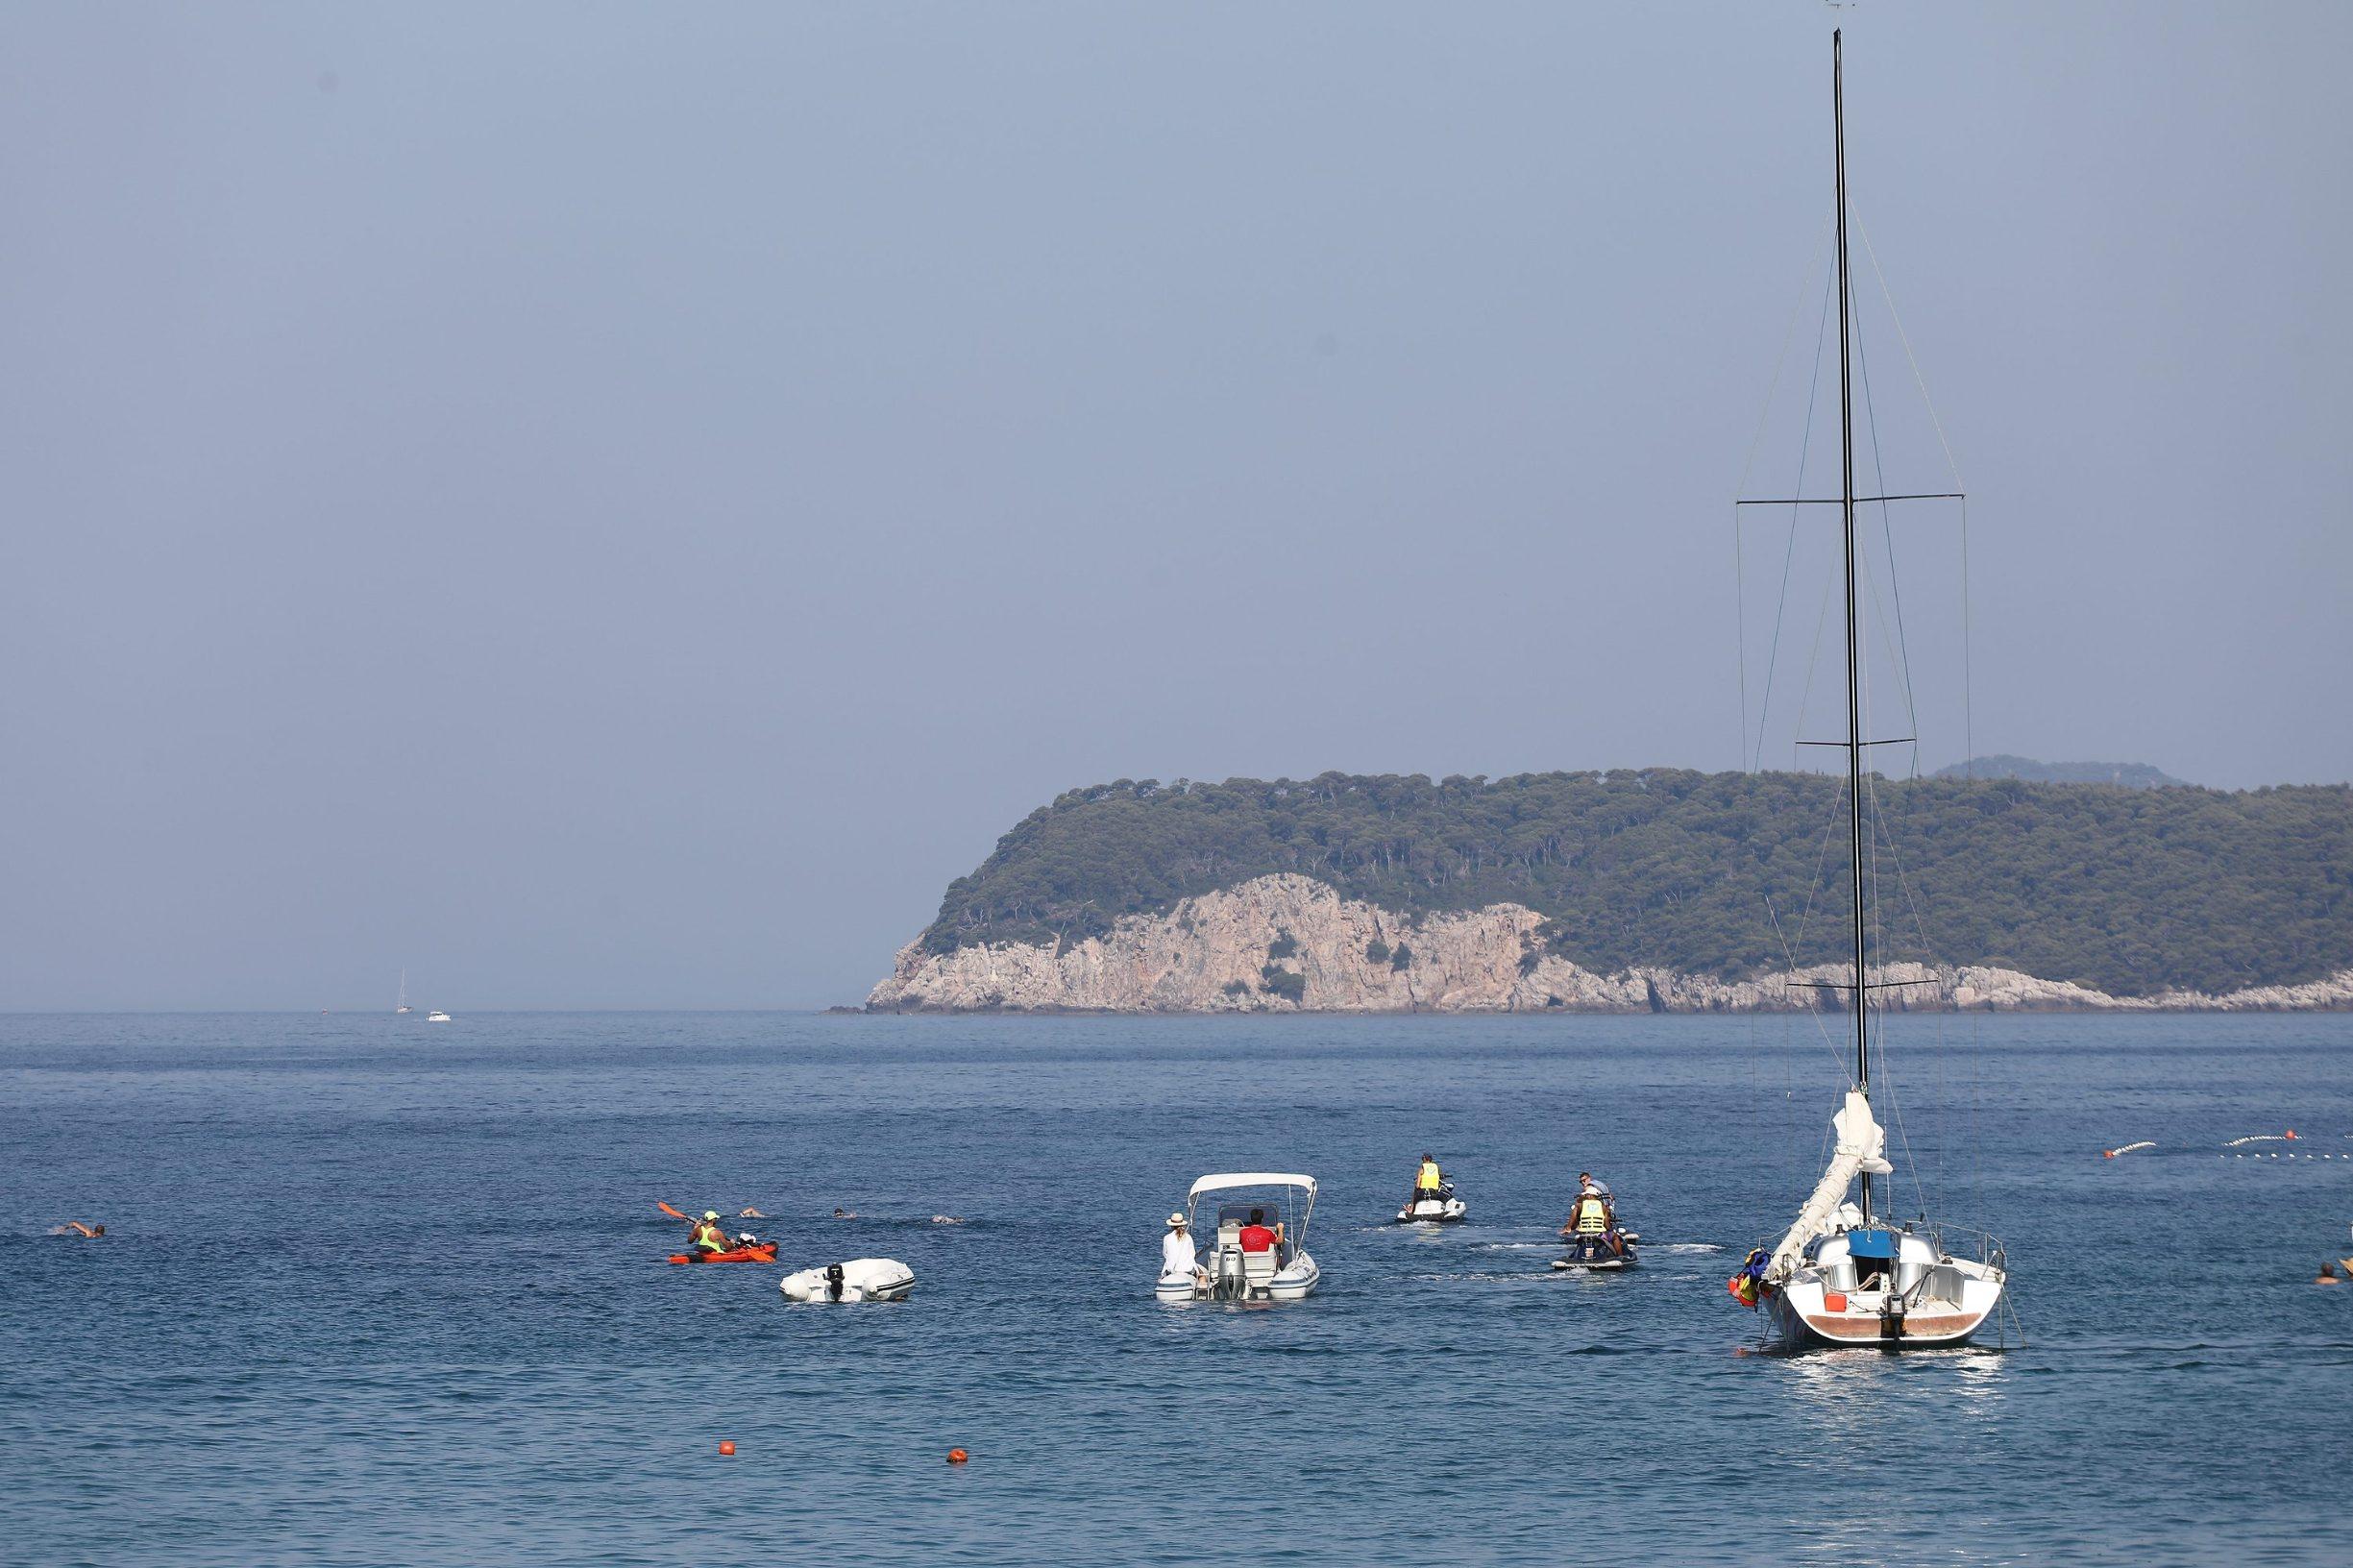 Dubrovnik, 060719. Domagoj Jakopovic Ribafish jutros je s lapadske plaze krenuo u jednomjesecni plivacki maraton RokOtok, u spomen na preminulog sina Roka.  Foto: Bozo Radic / CROPIX